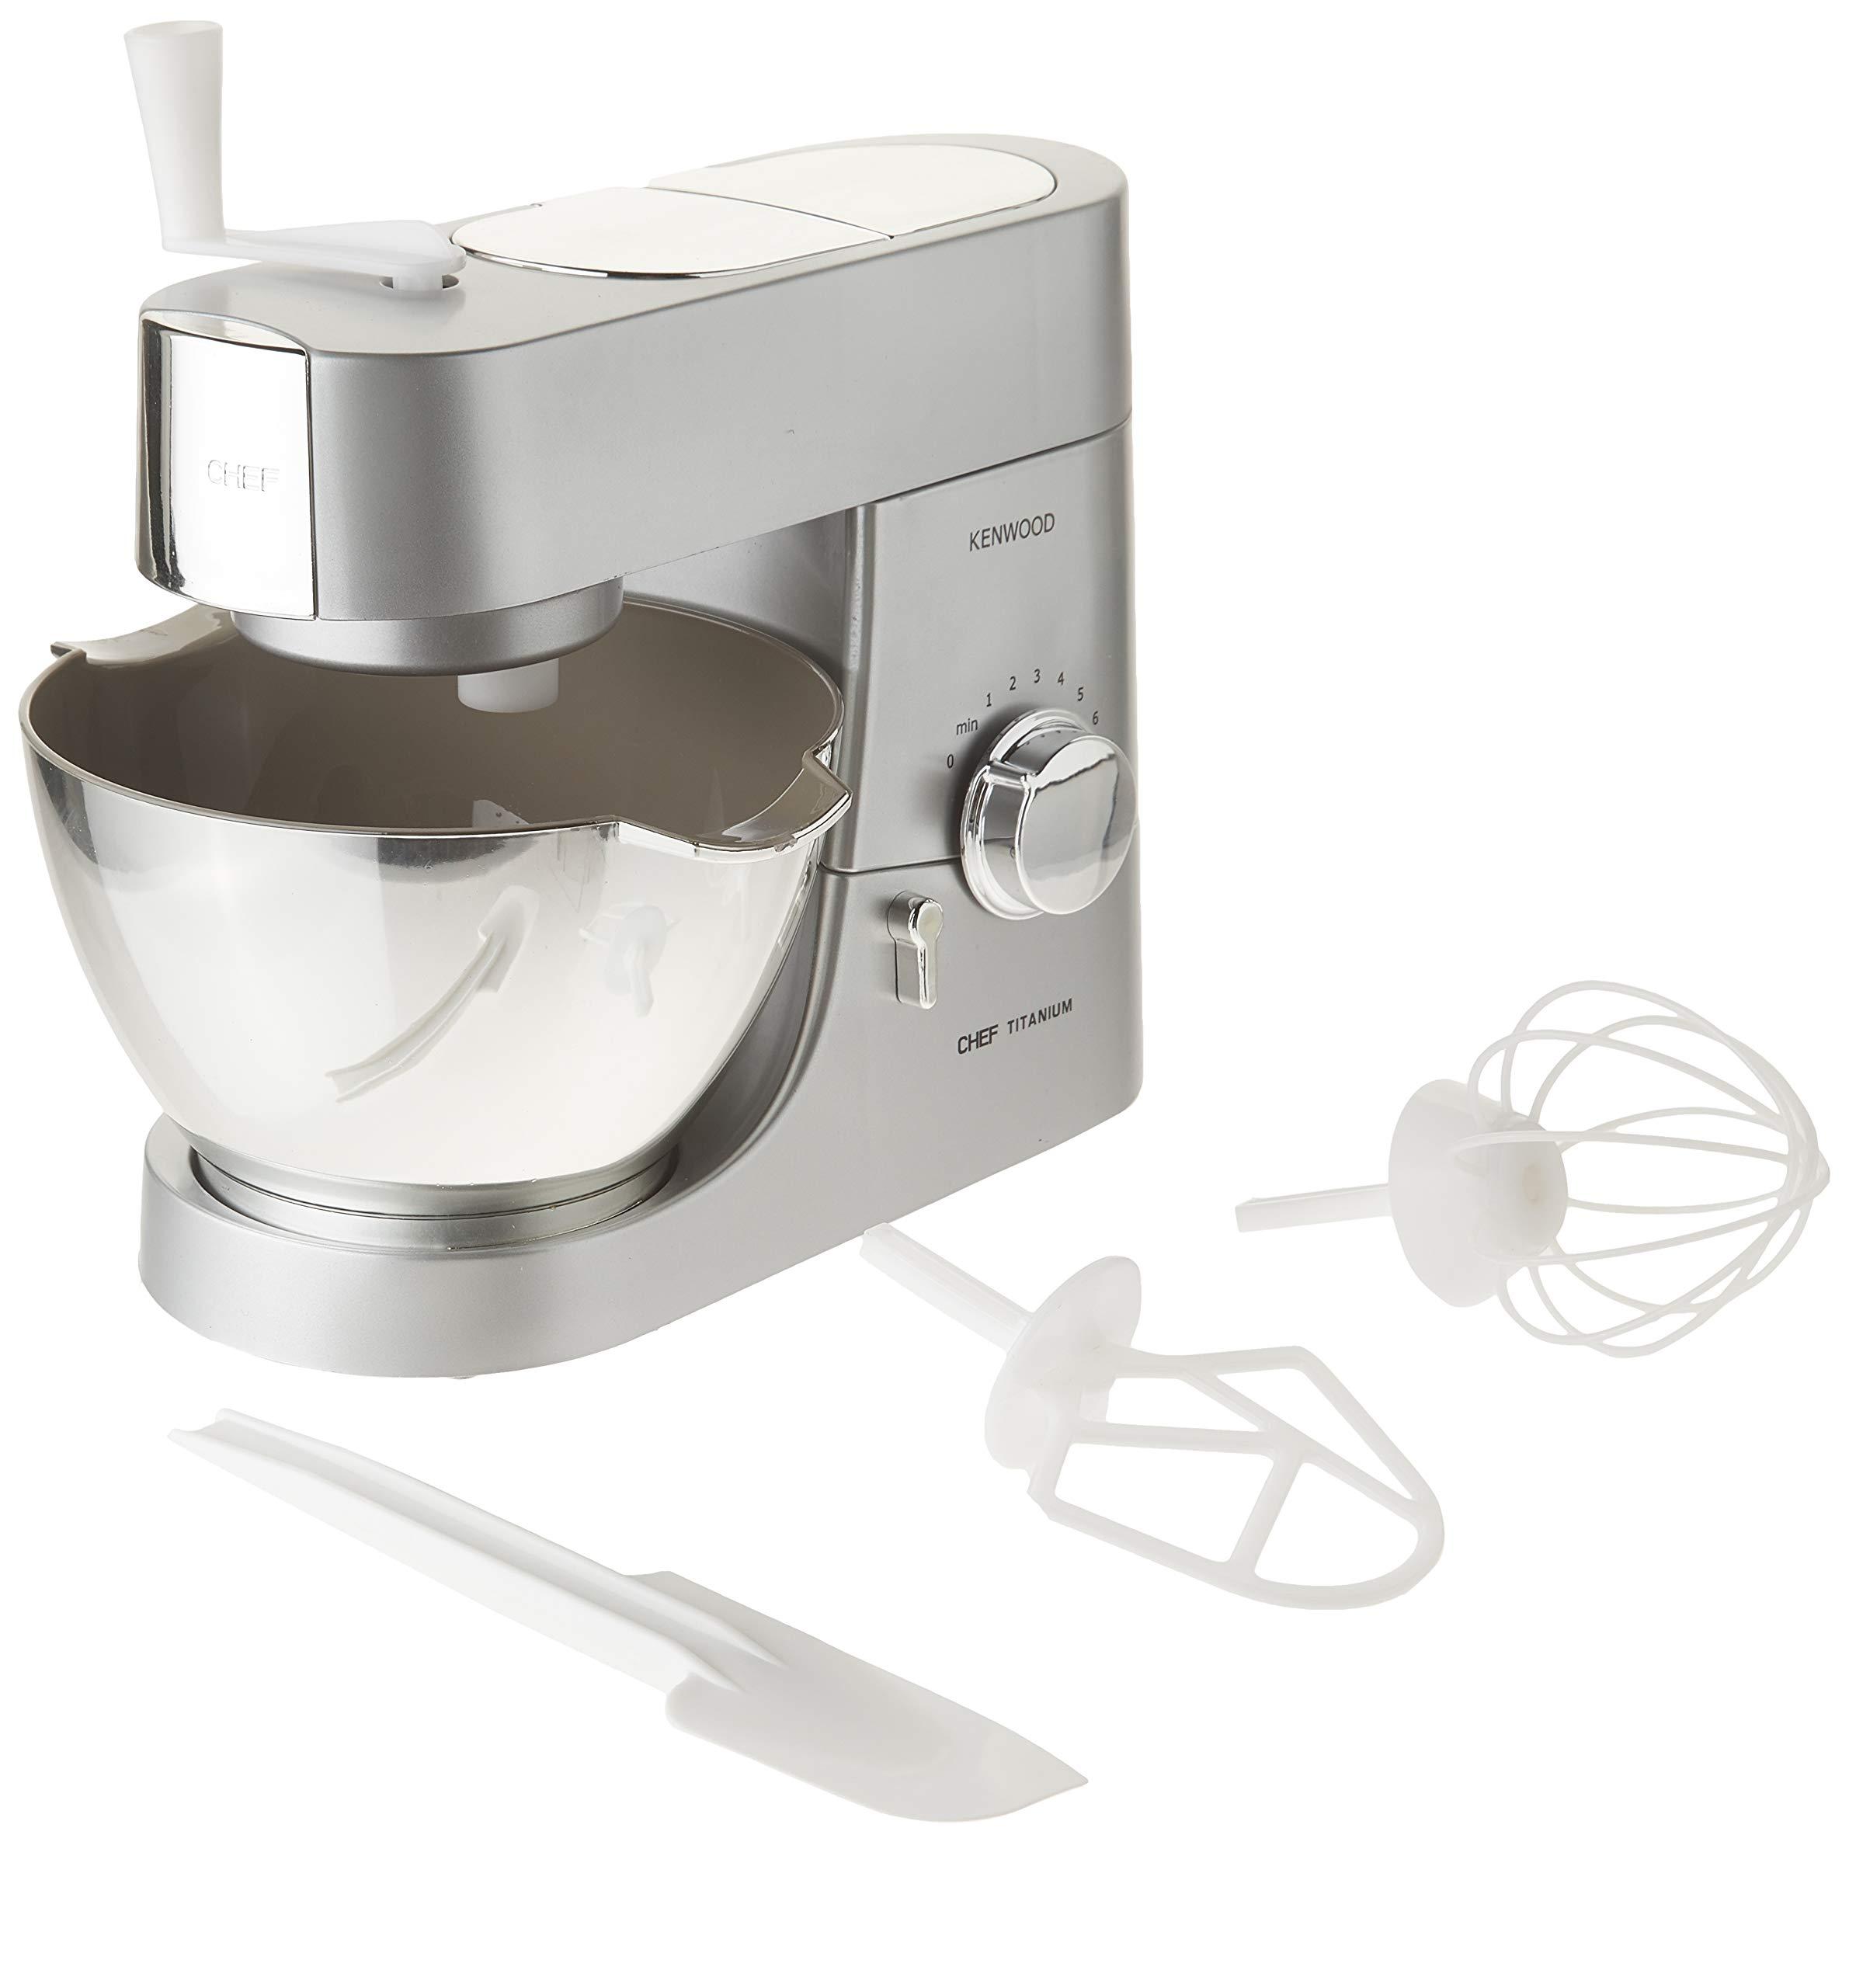 CASDON Little Cook 63502 Kenwood Toy Mixer, Silver/Chrome Effect by CASDON